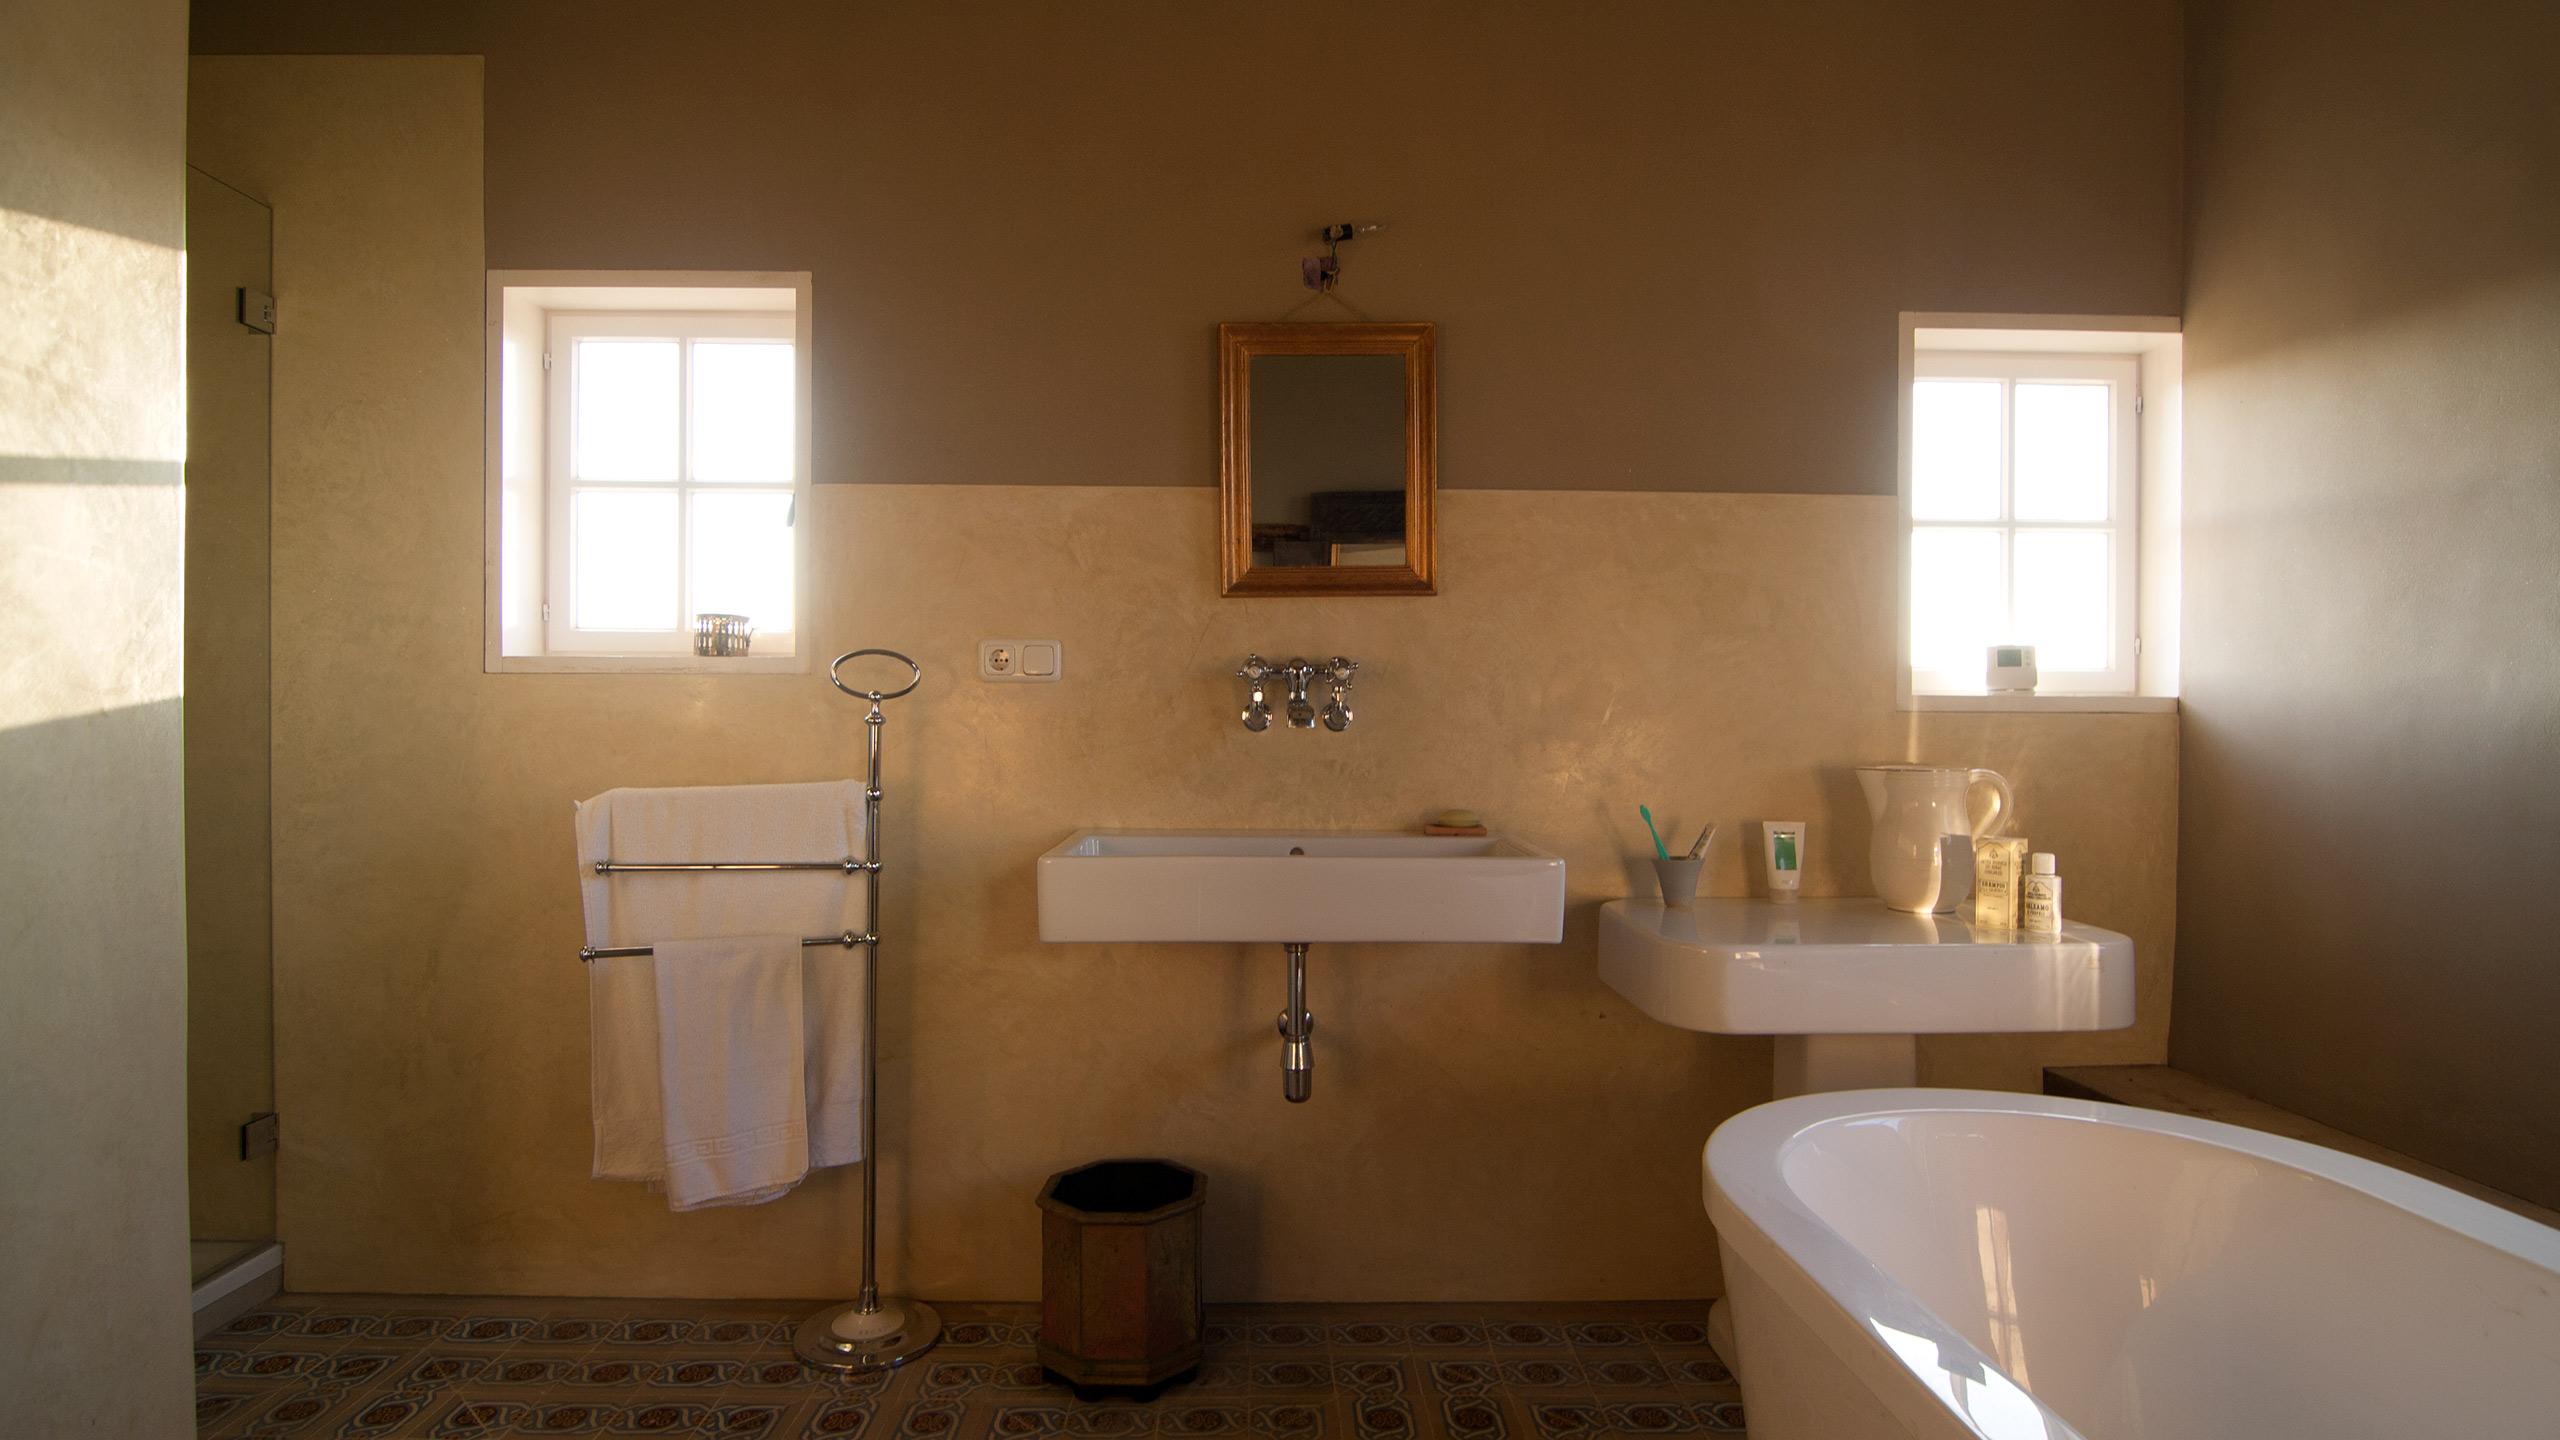 WaterproofStucco - Luxury bathroom, Soft light